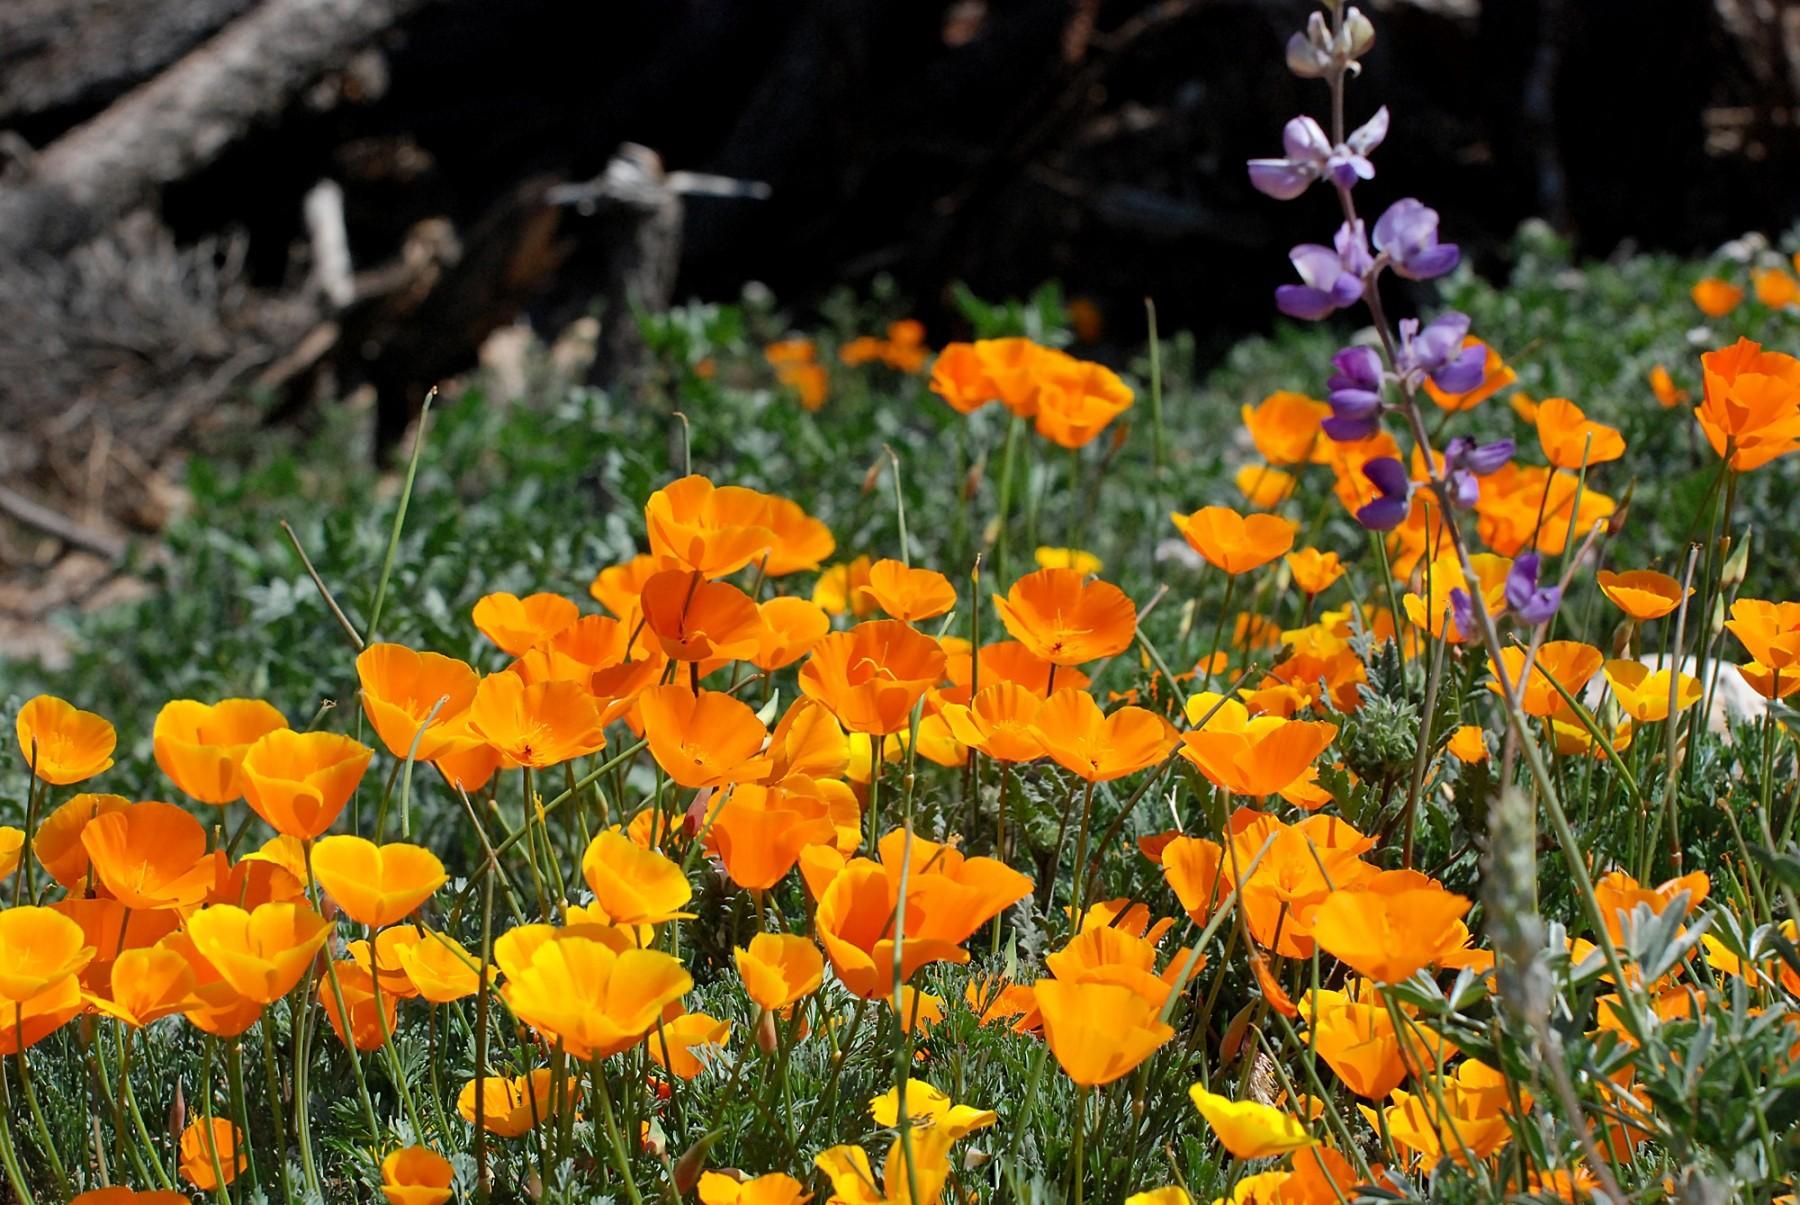 Fiori Gialli Giardino.Sfondi Giardino Natura Fiori Gialli Papaveri Glicine Fiore